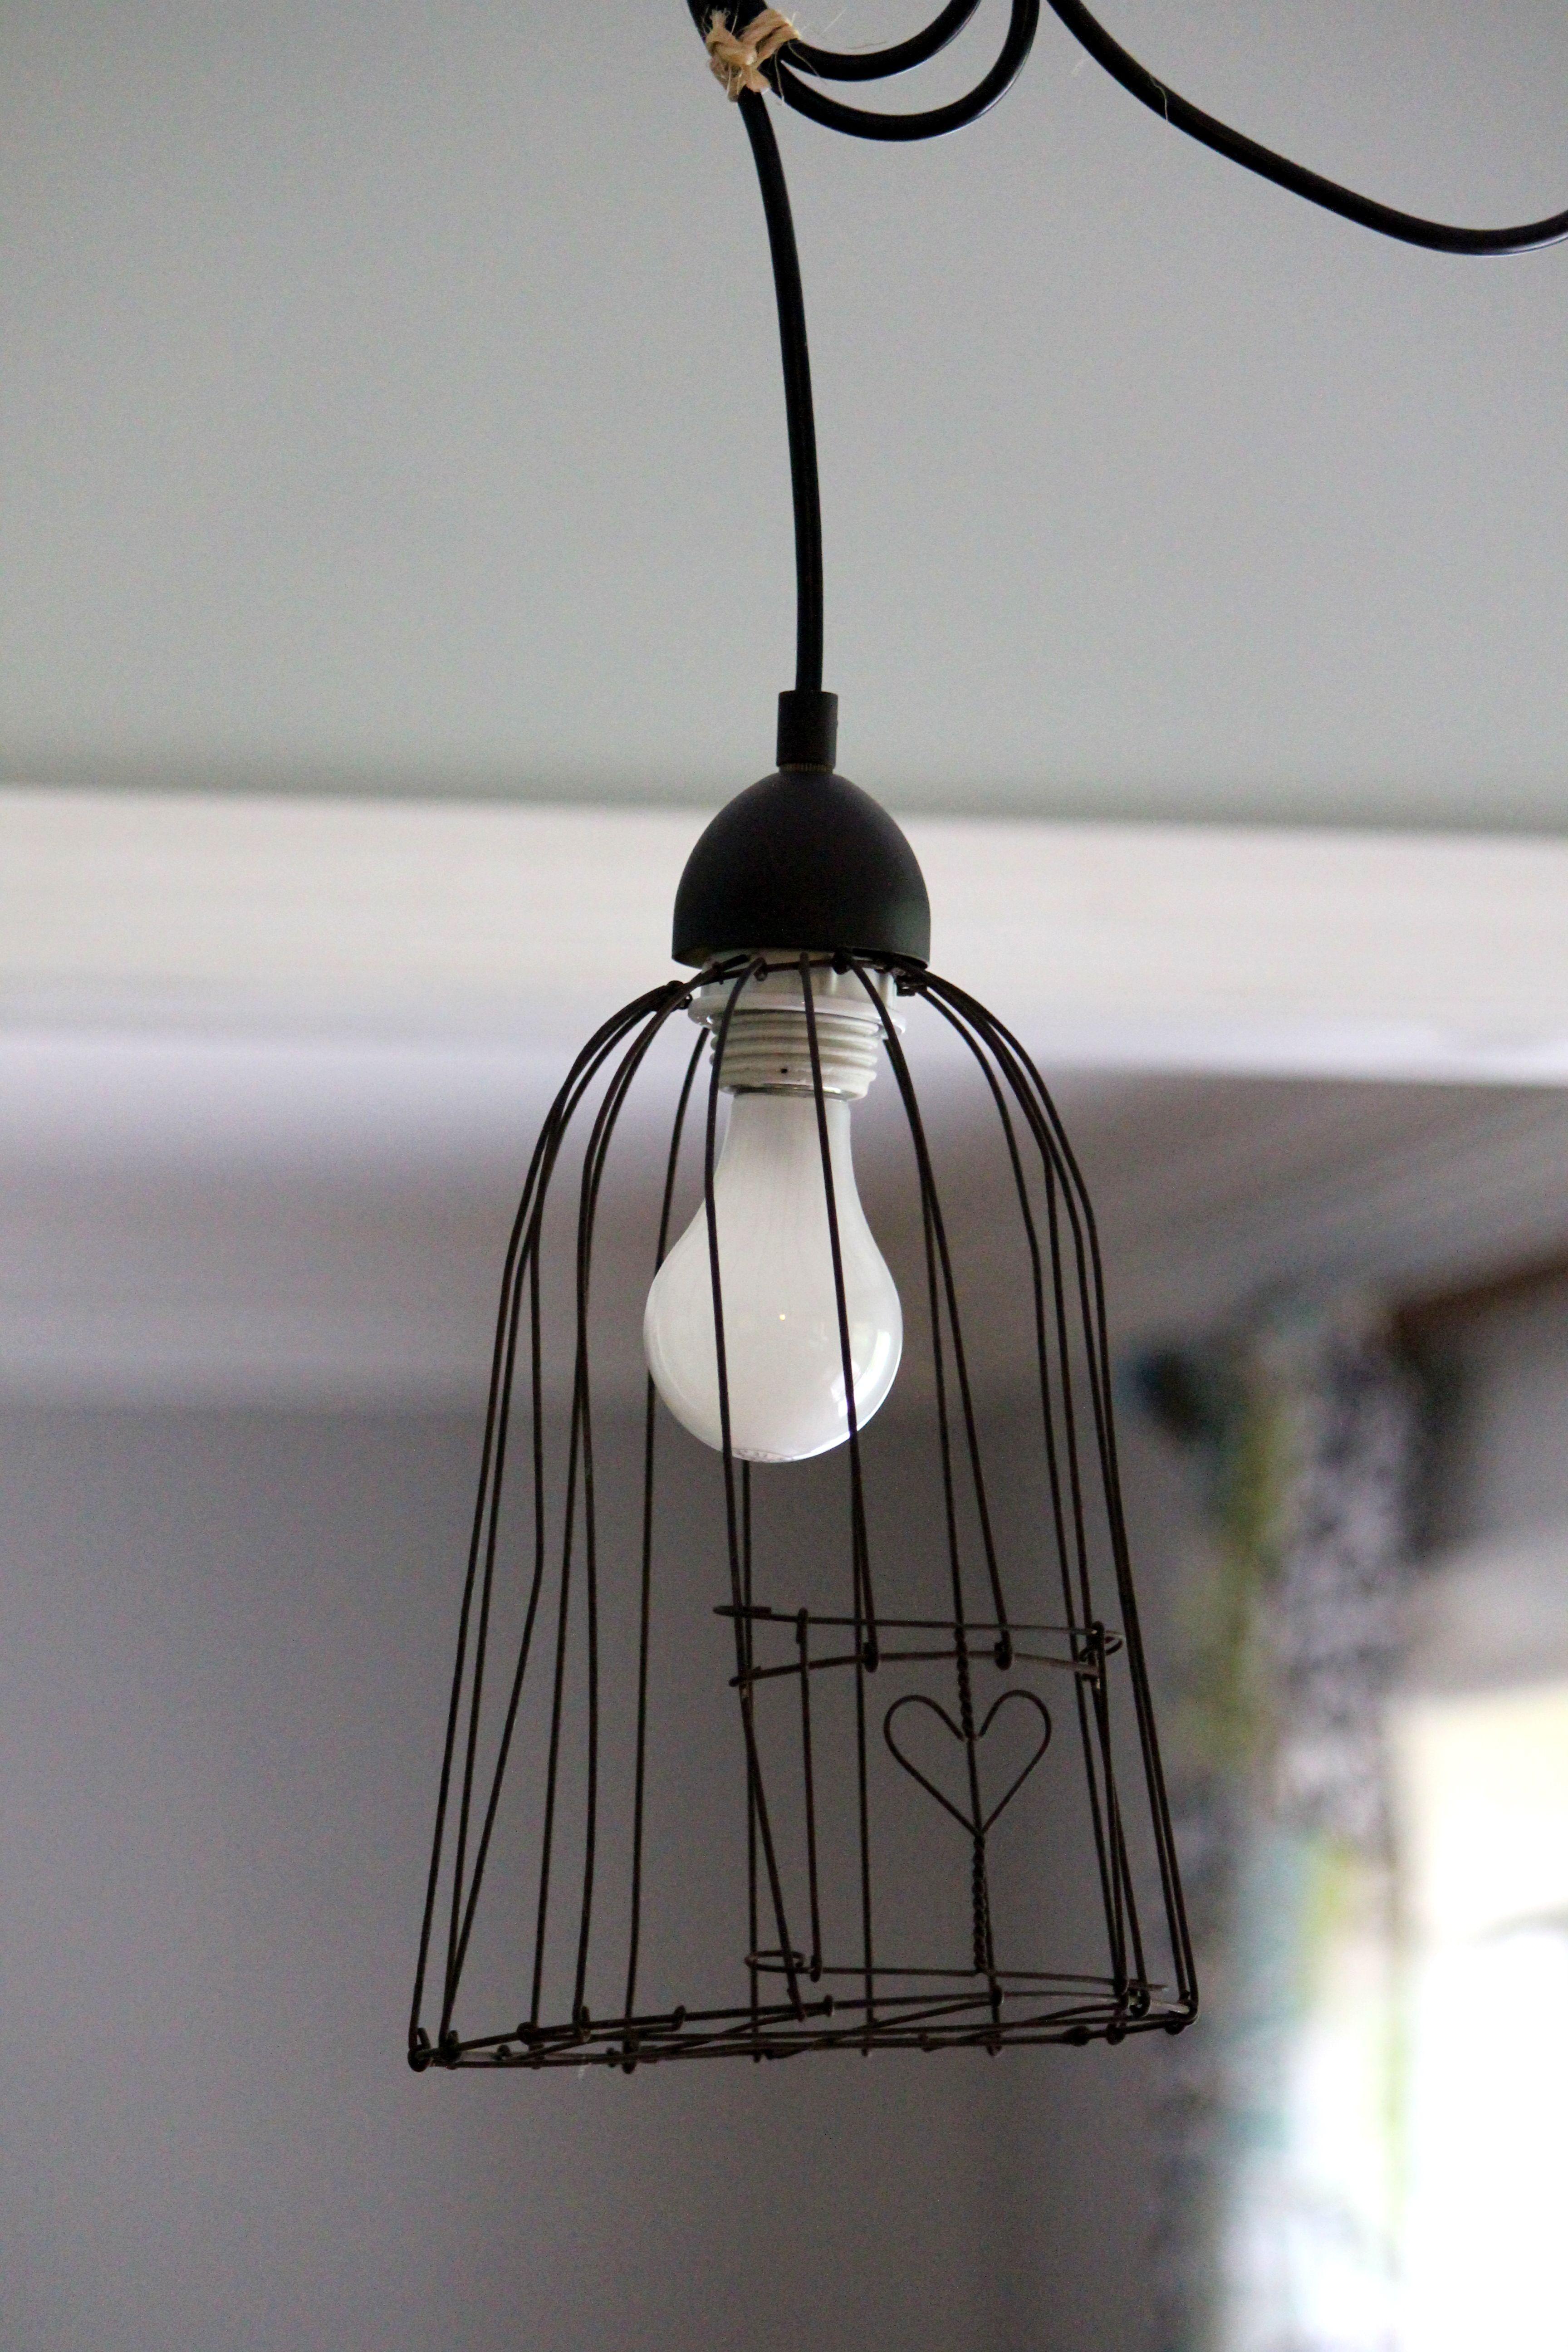 Lighting bedroom diy lmparas pinterest bedrooms lamp ideas little heart bird cage pendant light greentooth Image collections